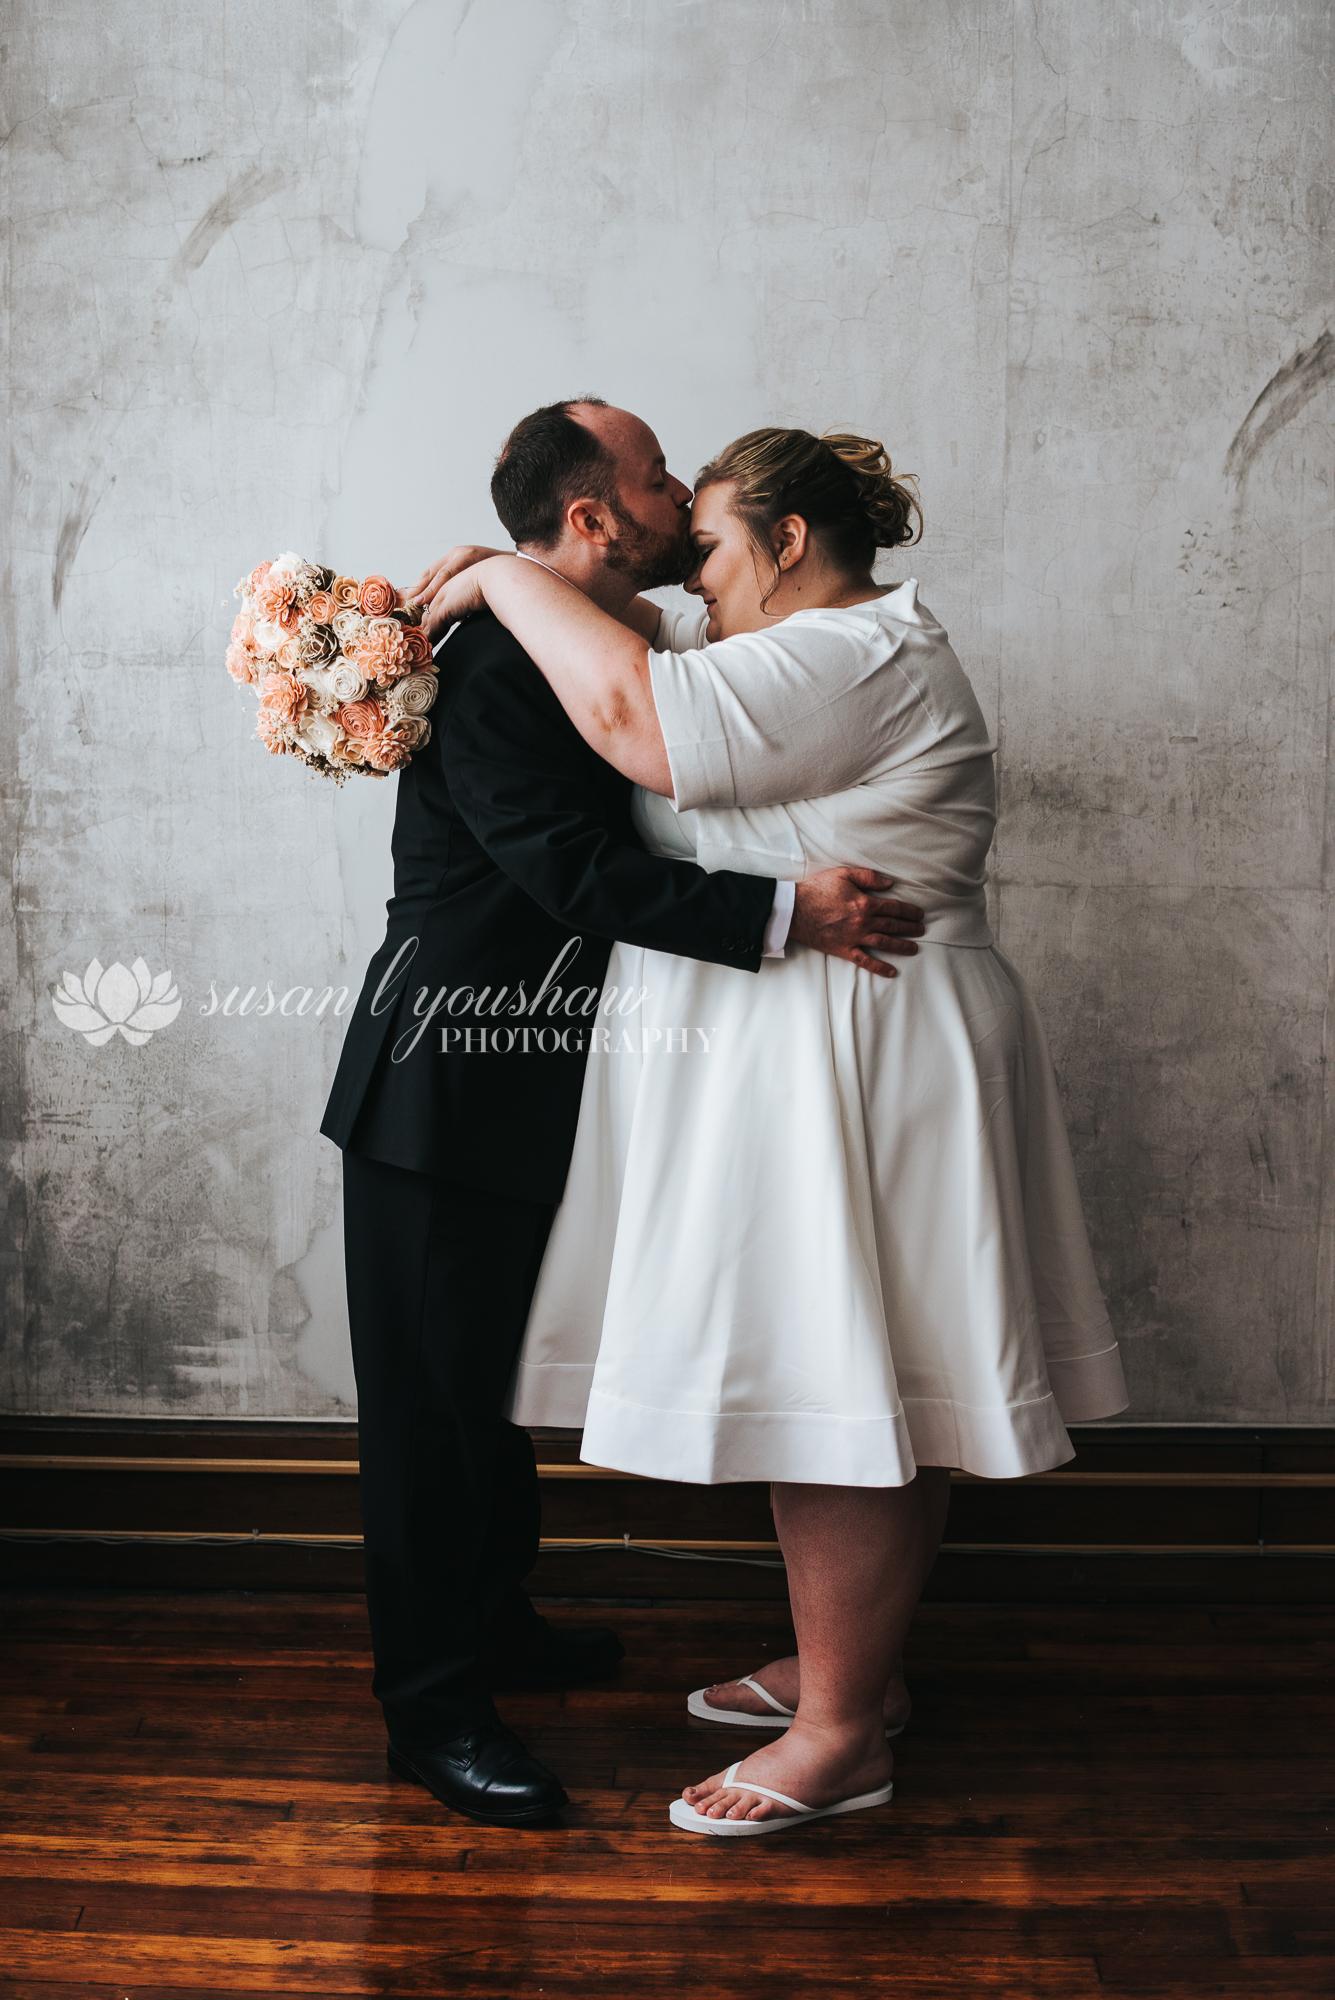 Bill and Sarah Wedding Photos 06-08-2019 SLY Photography -14.jpg